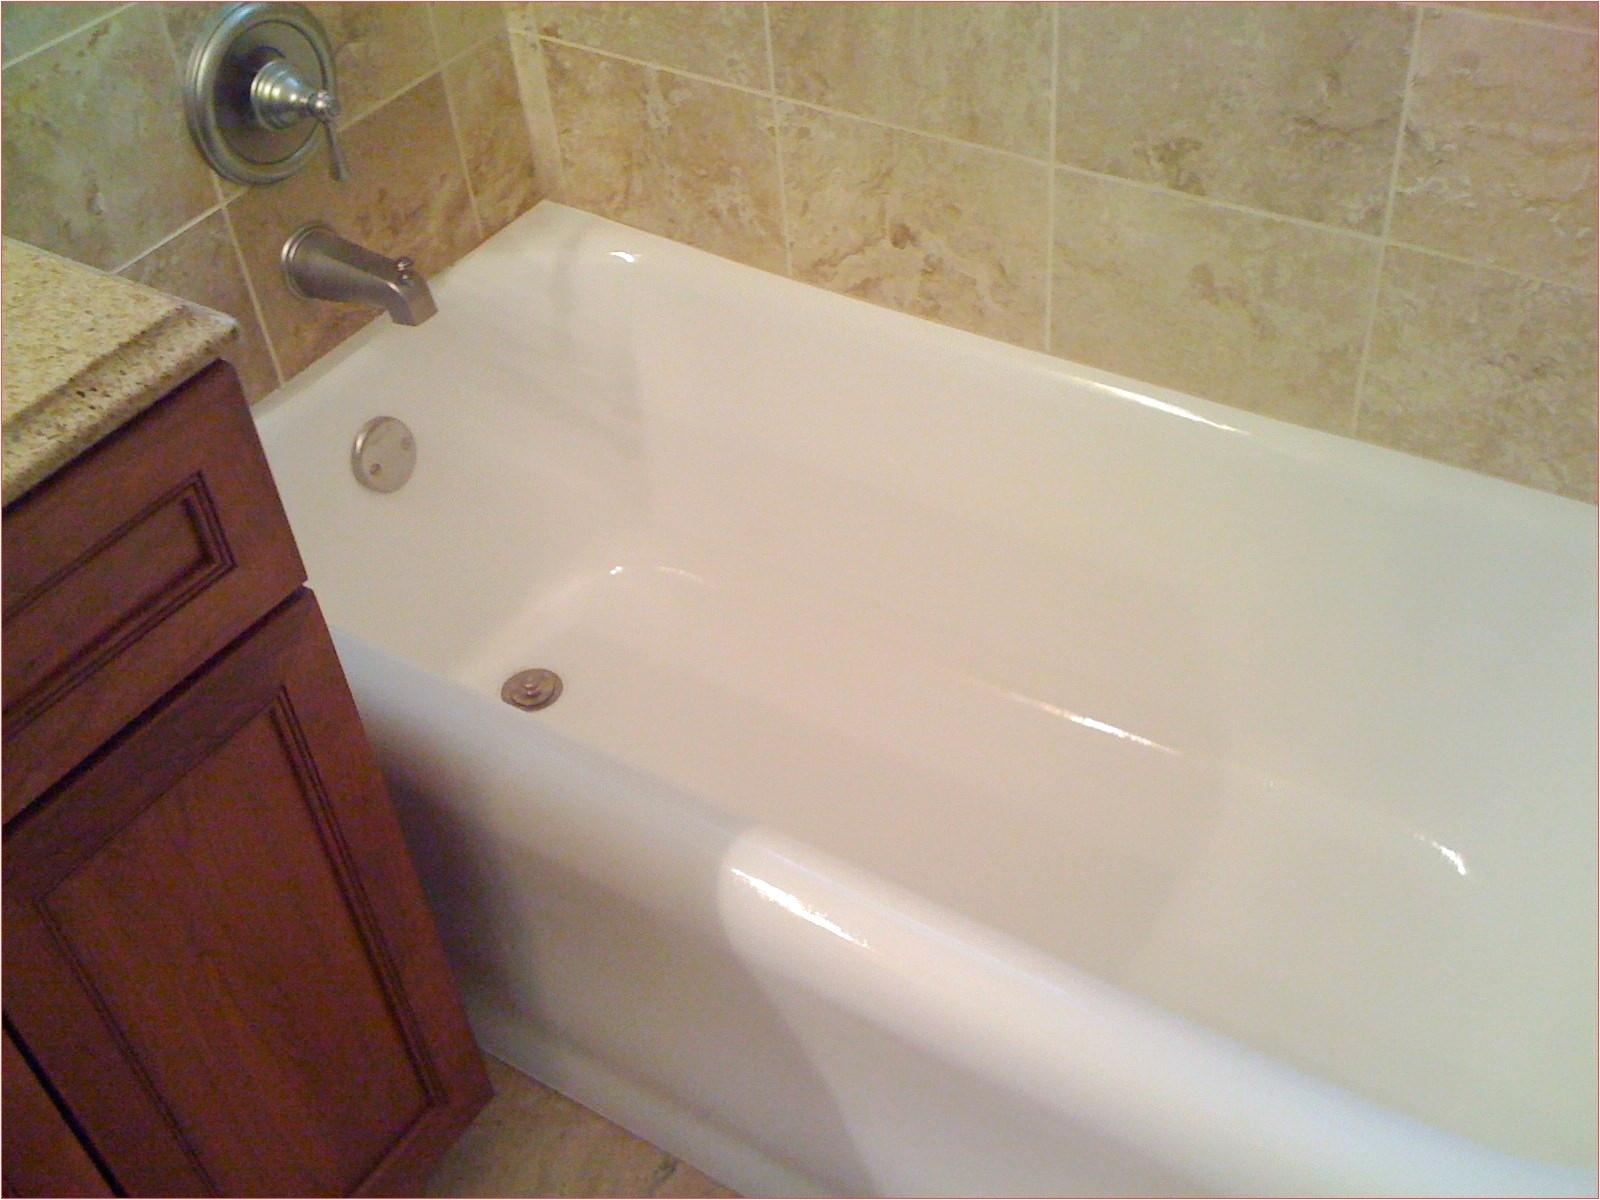 refinish fiberglass bathtub elegant img 0329h sink refinishing sinks and tubs can a fiberglass tub be